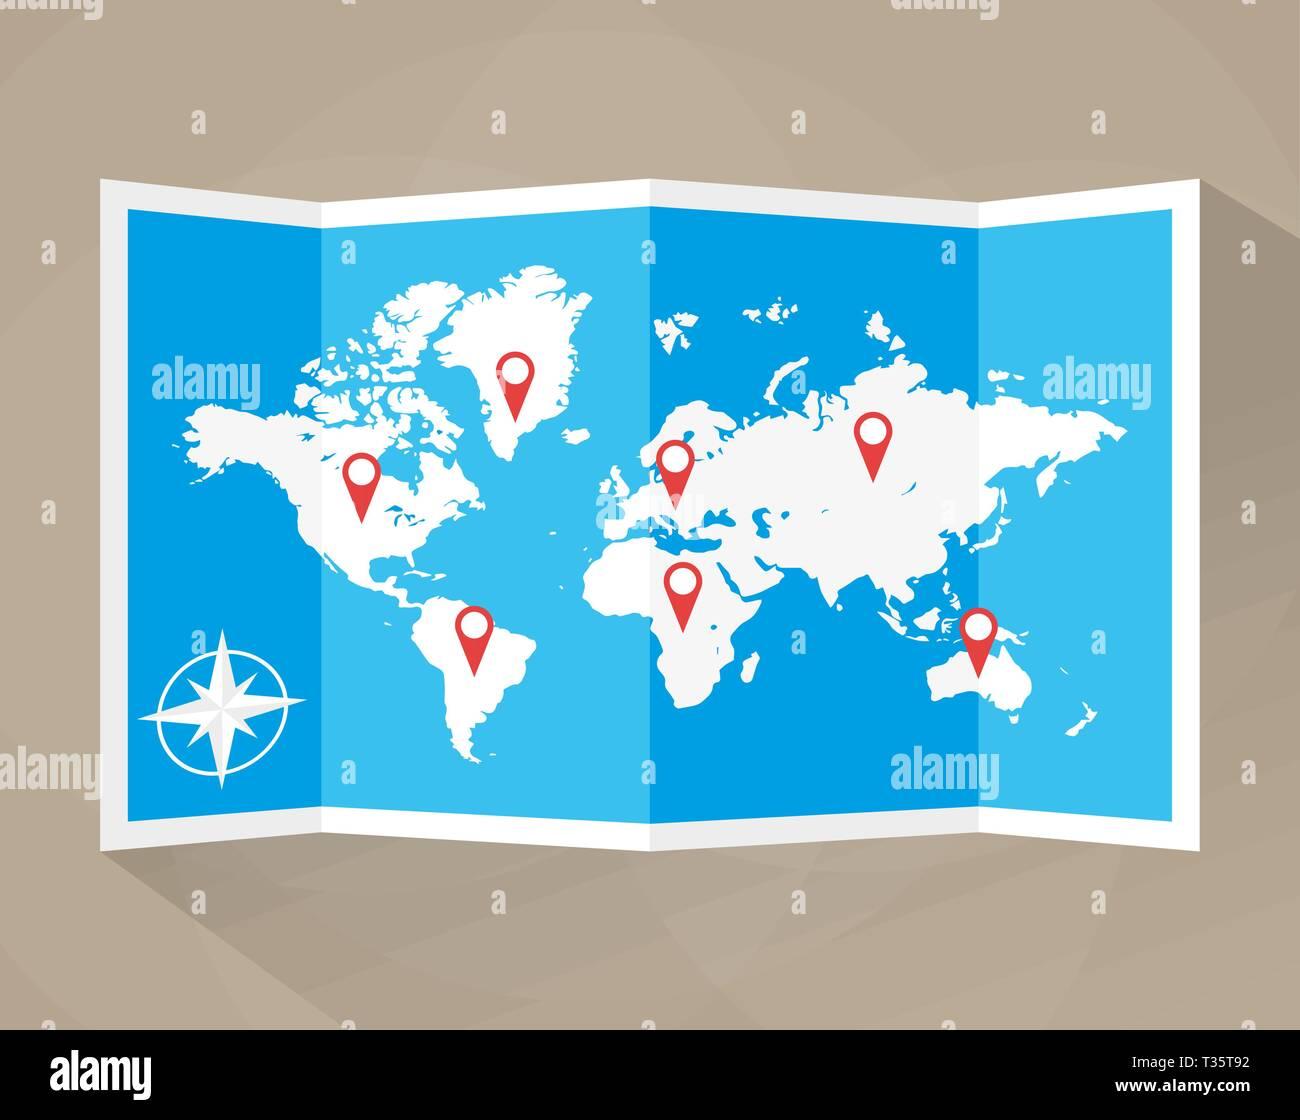 Gps Australia Map Location Stock Photos & Gps Australia Map Location on